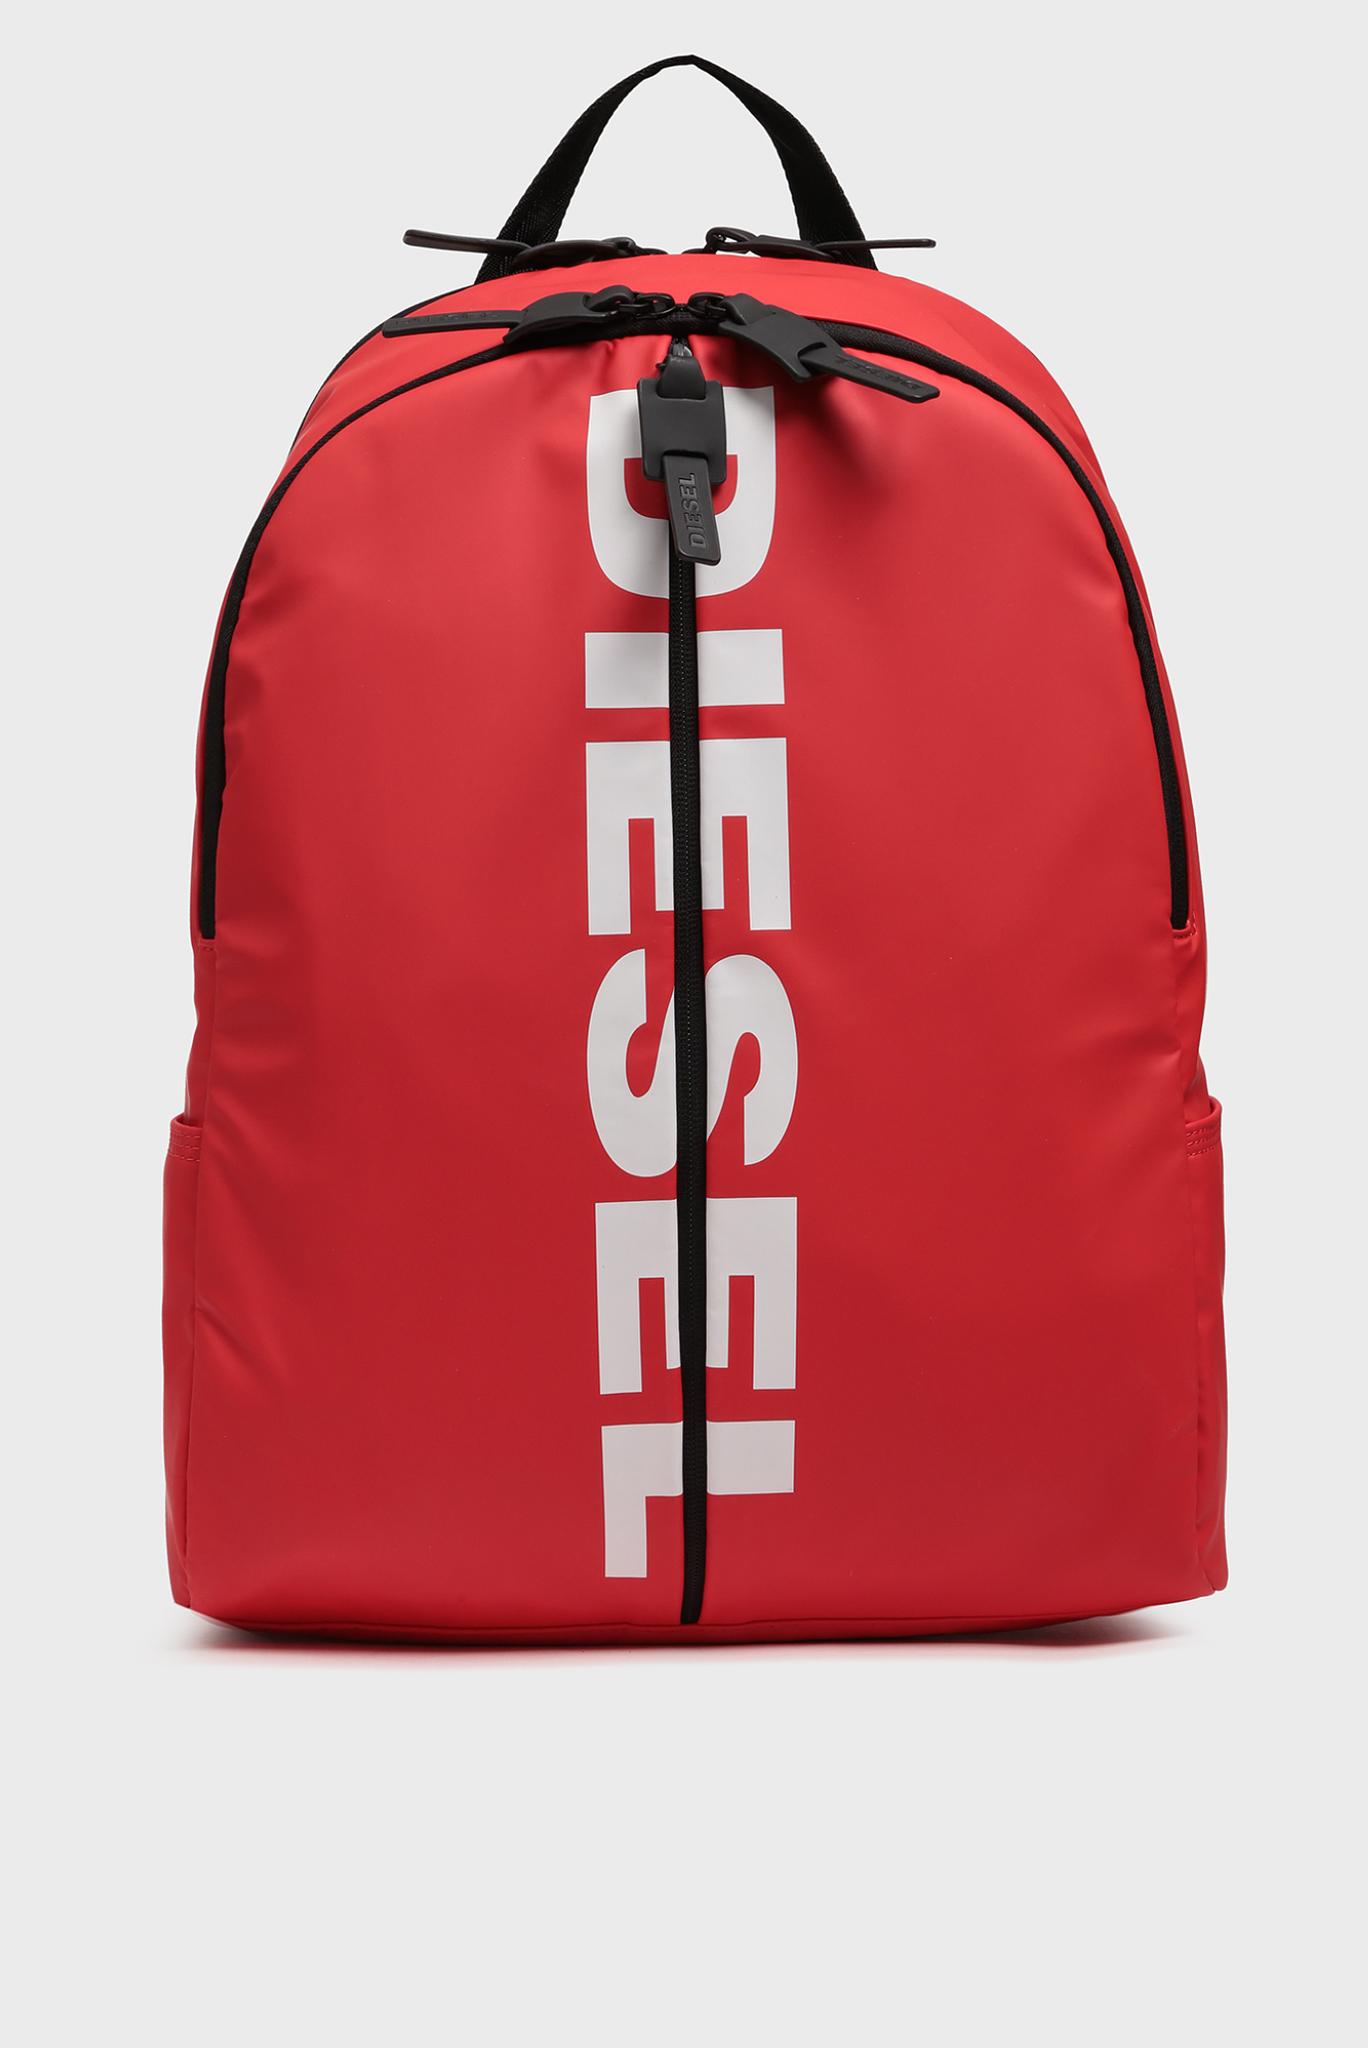 Мужской красный рюкзак BOLDMESSAGE / BOLD BACK Diesel